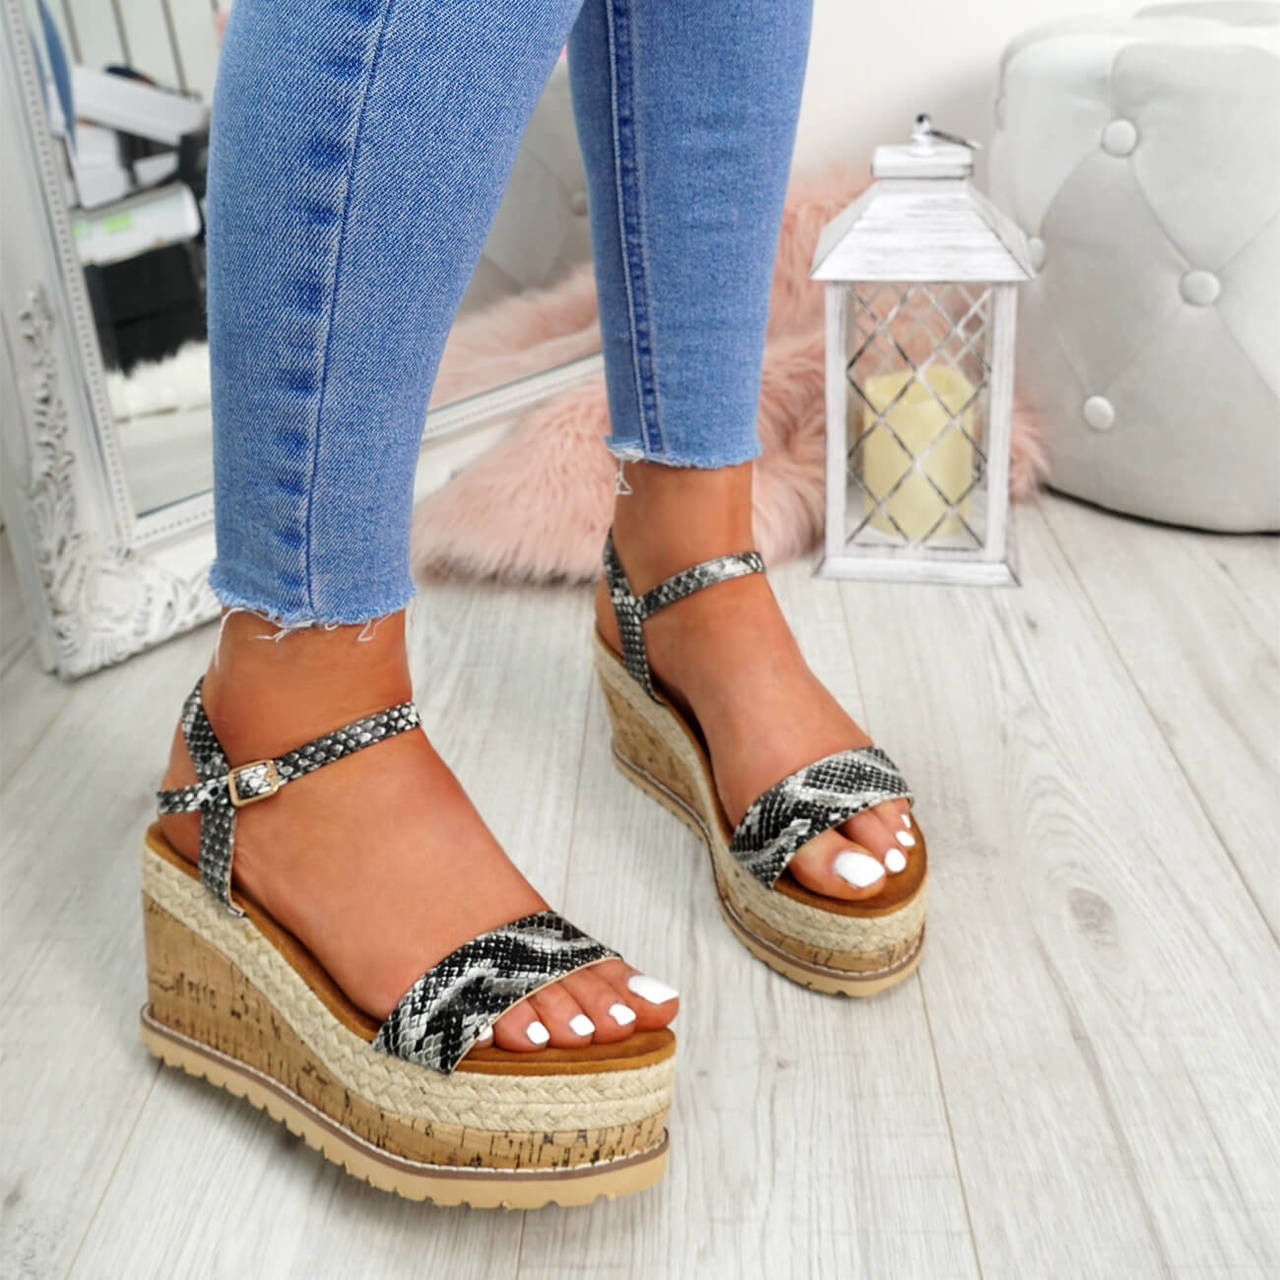 db20bf1738e2 Womens Ladies High Heel Platform Sandals Wedge Buckle Peep Toe Shoes ...